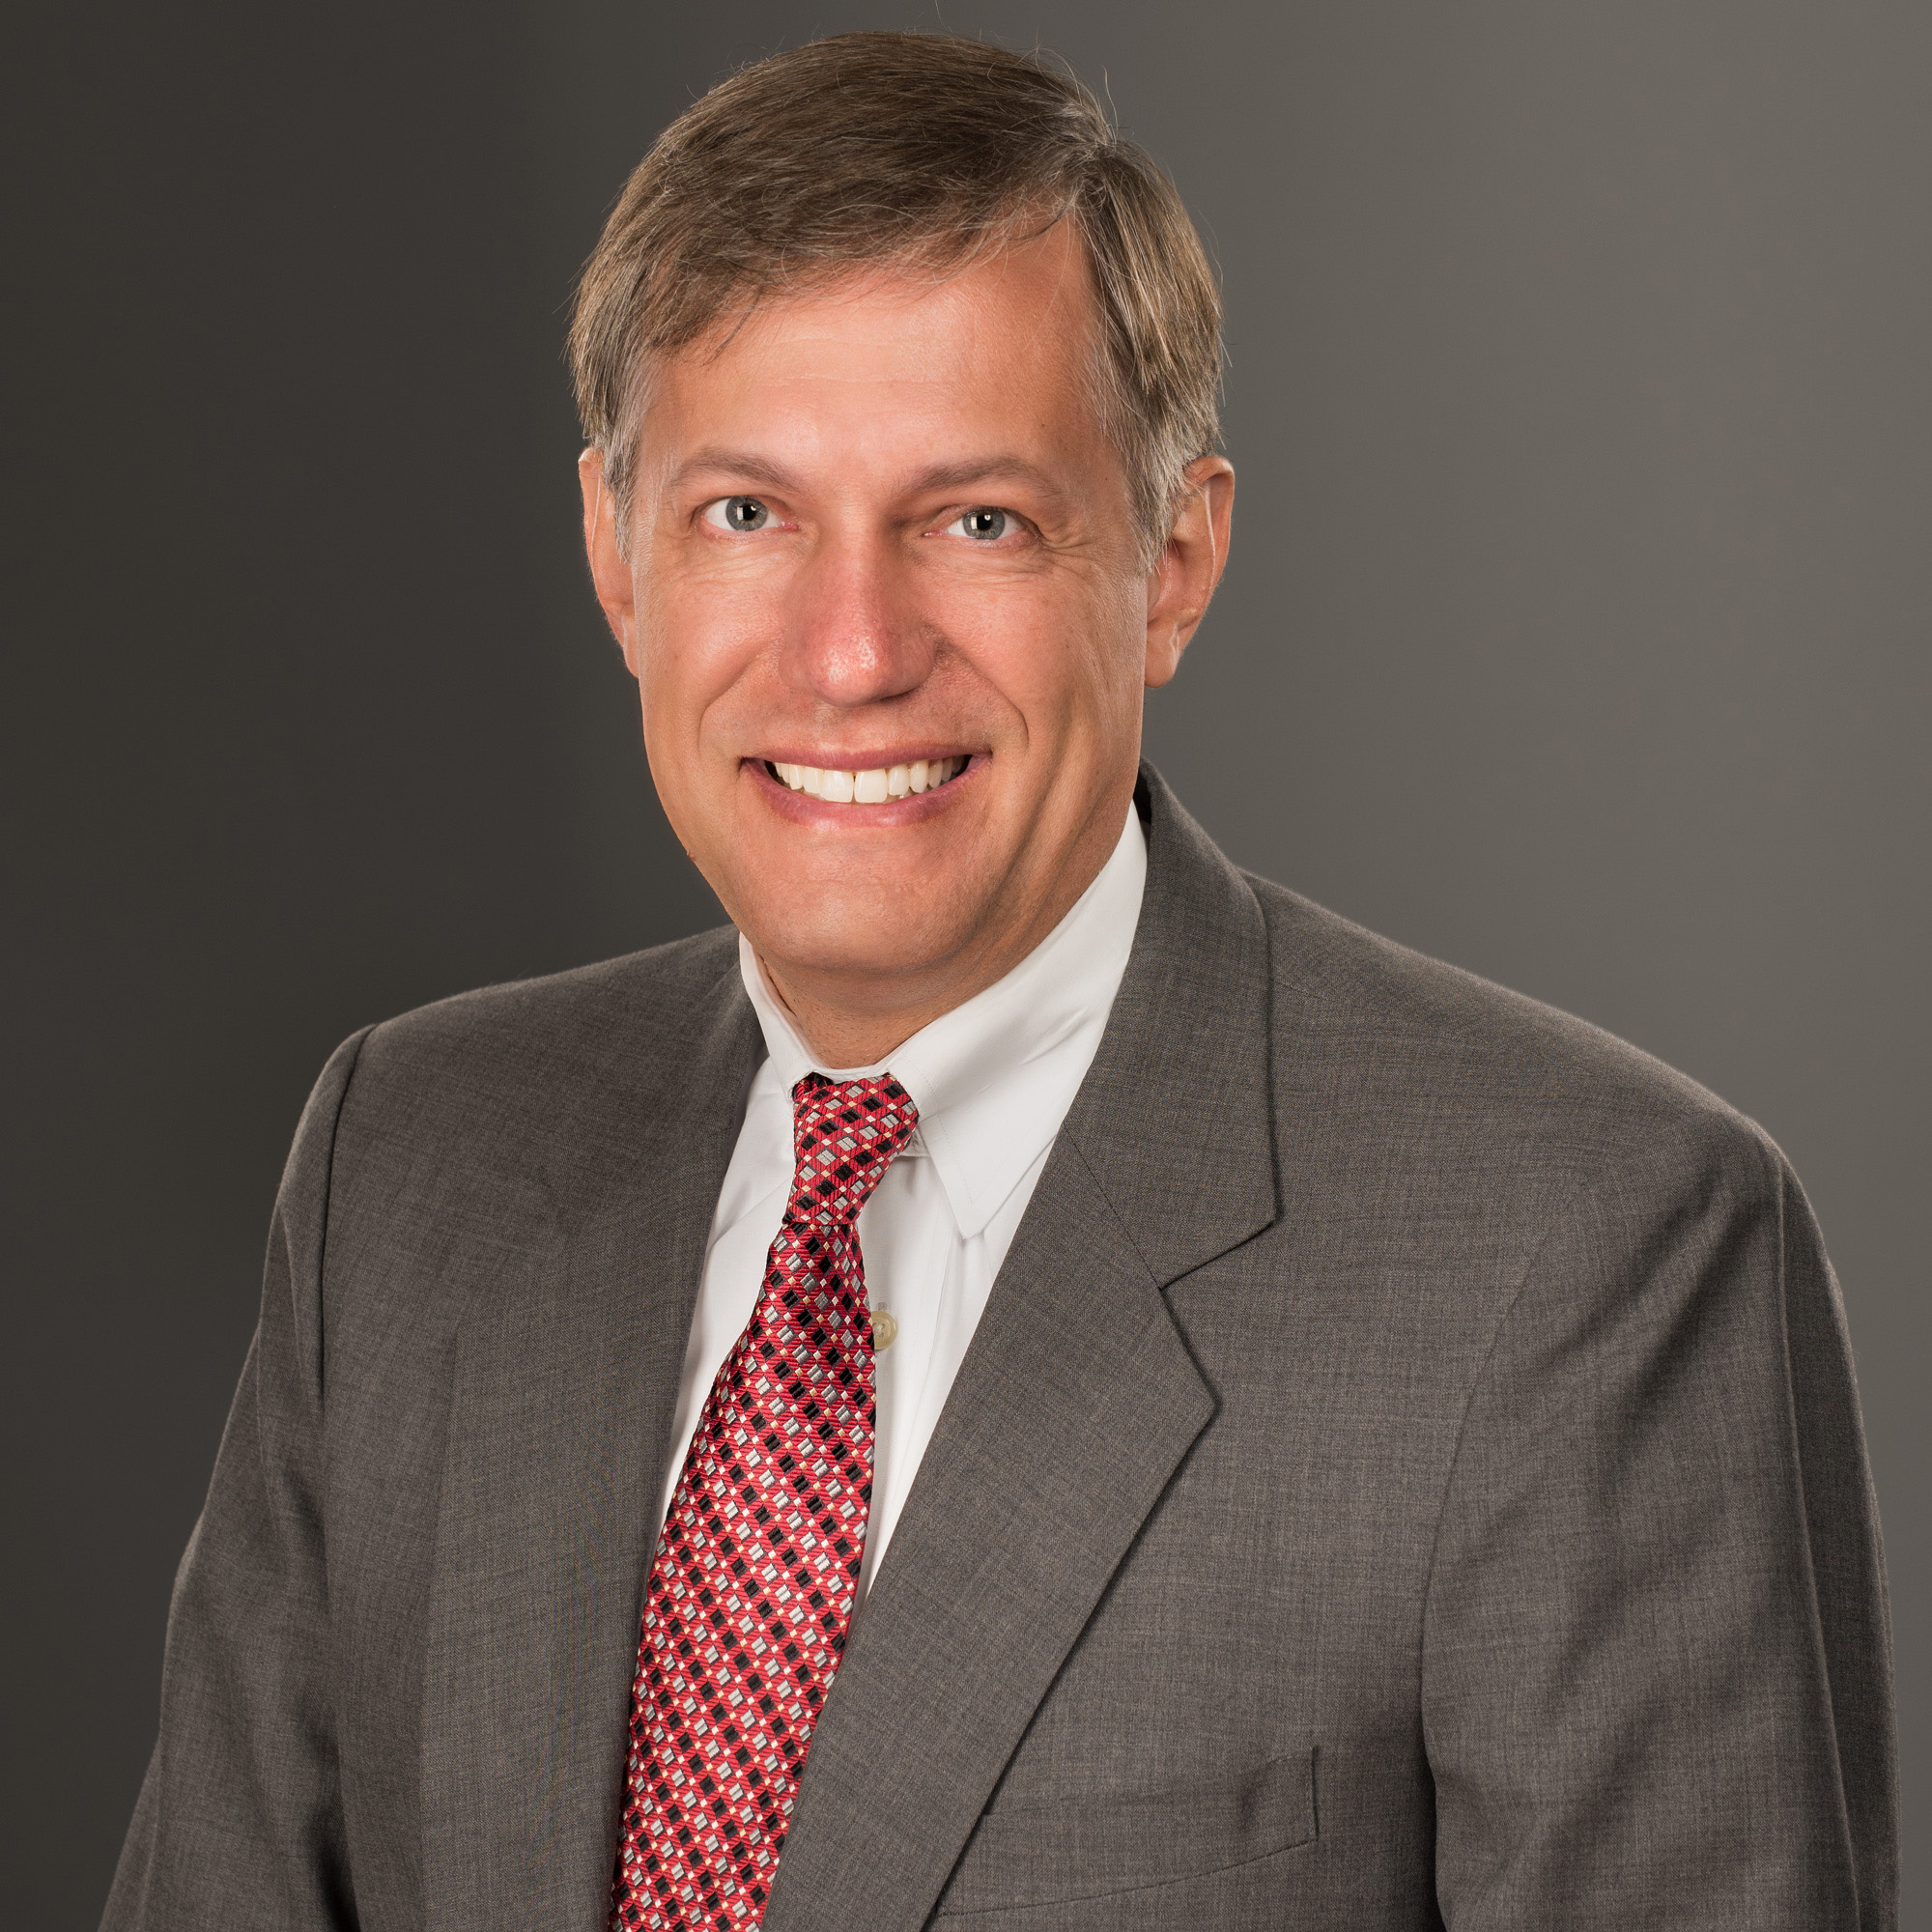 C. Dean Furman